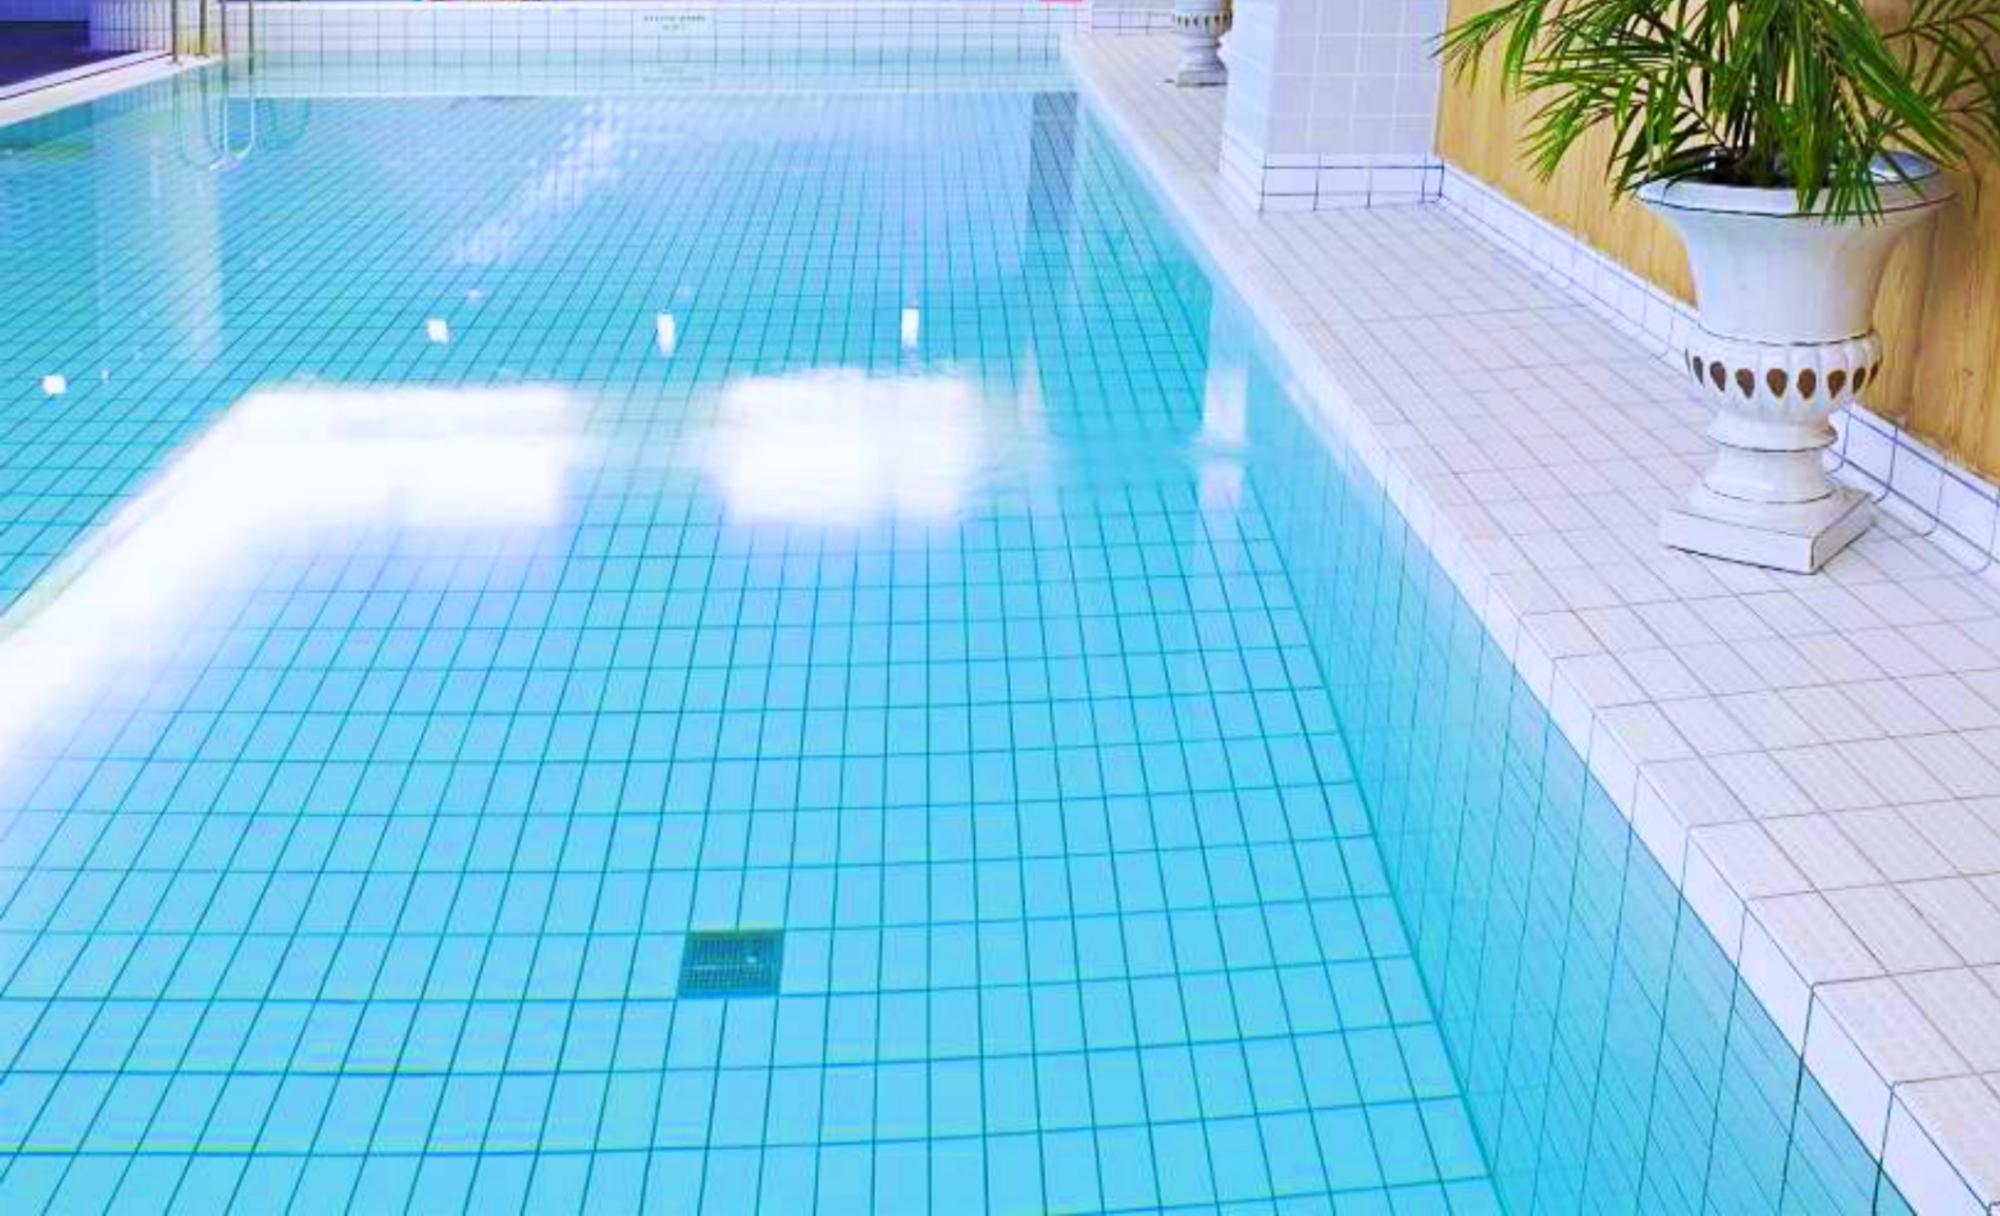 Sokos Hotel Presidentti Swimming Pool